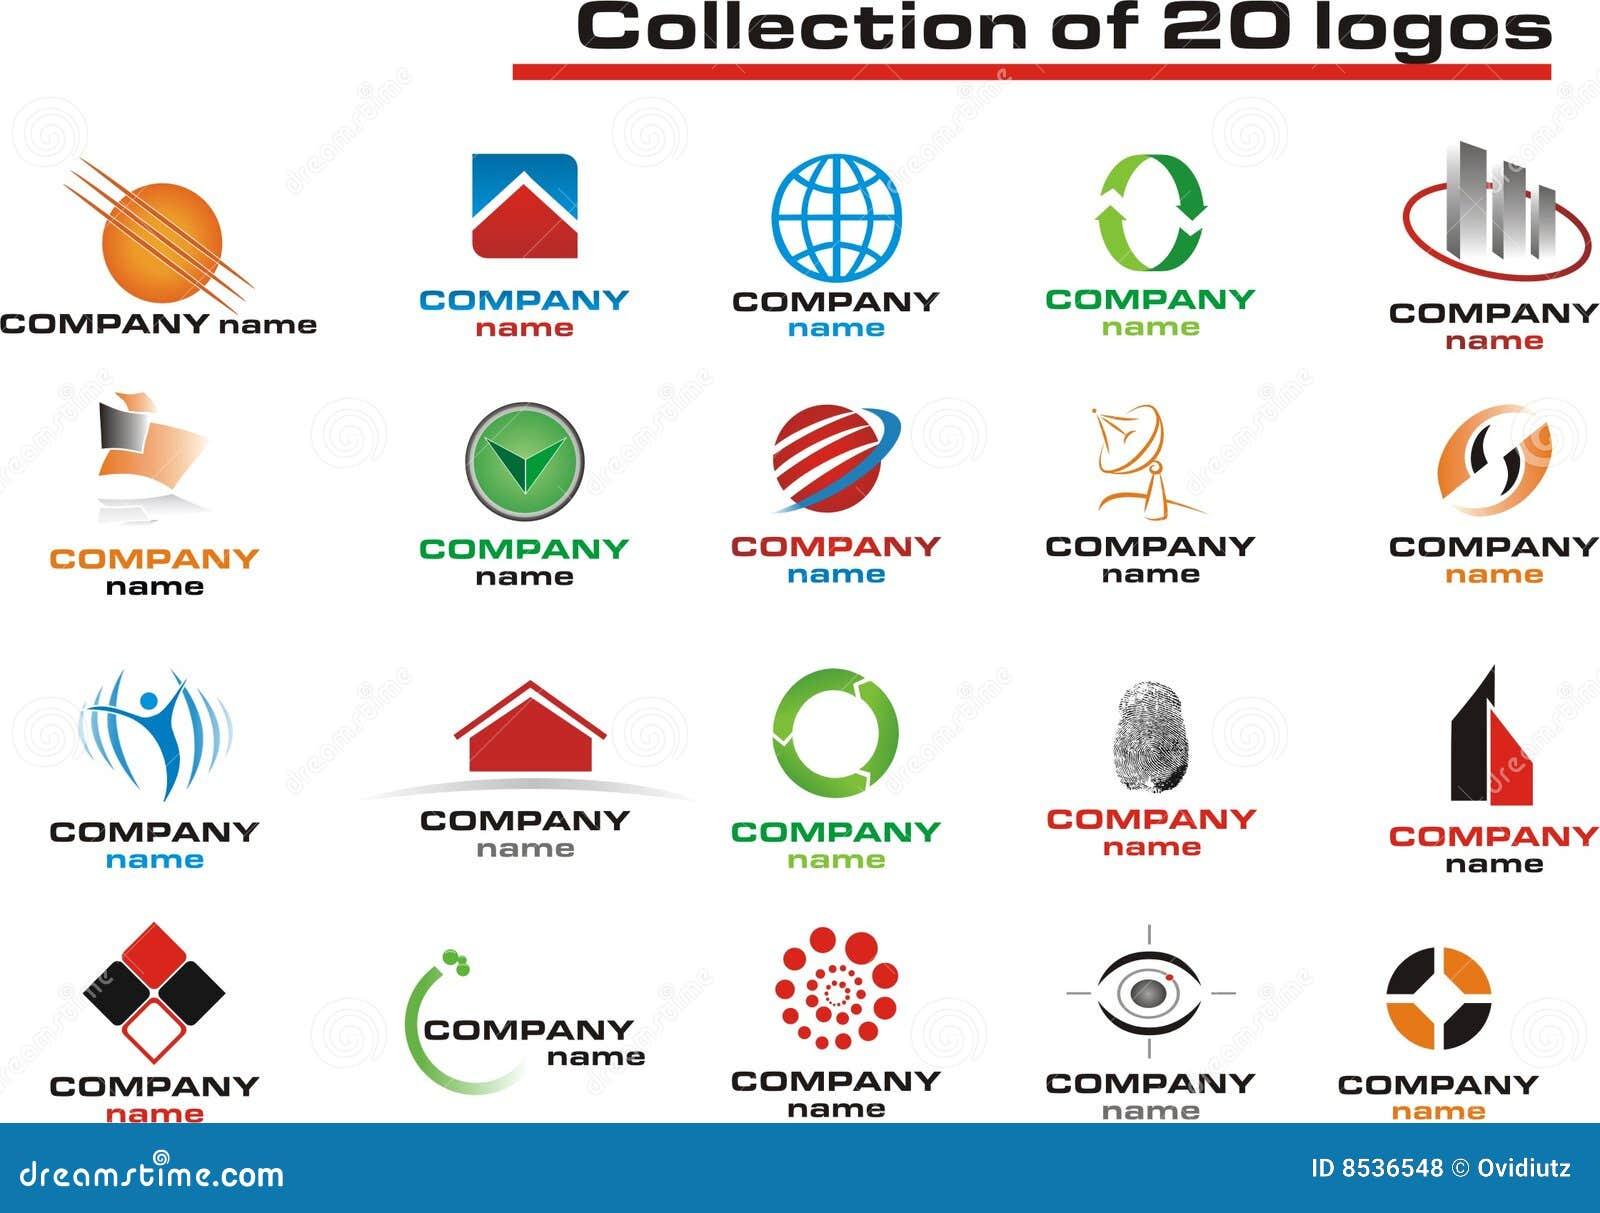 Designing company logos free